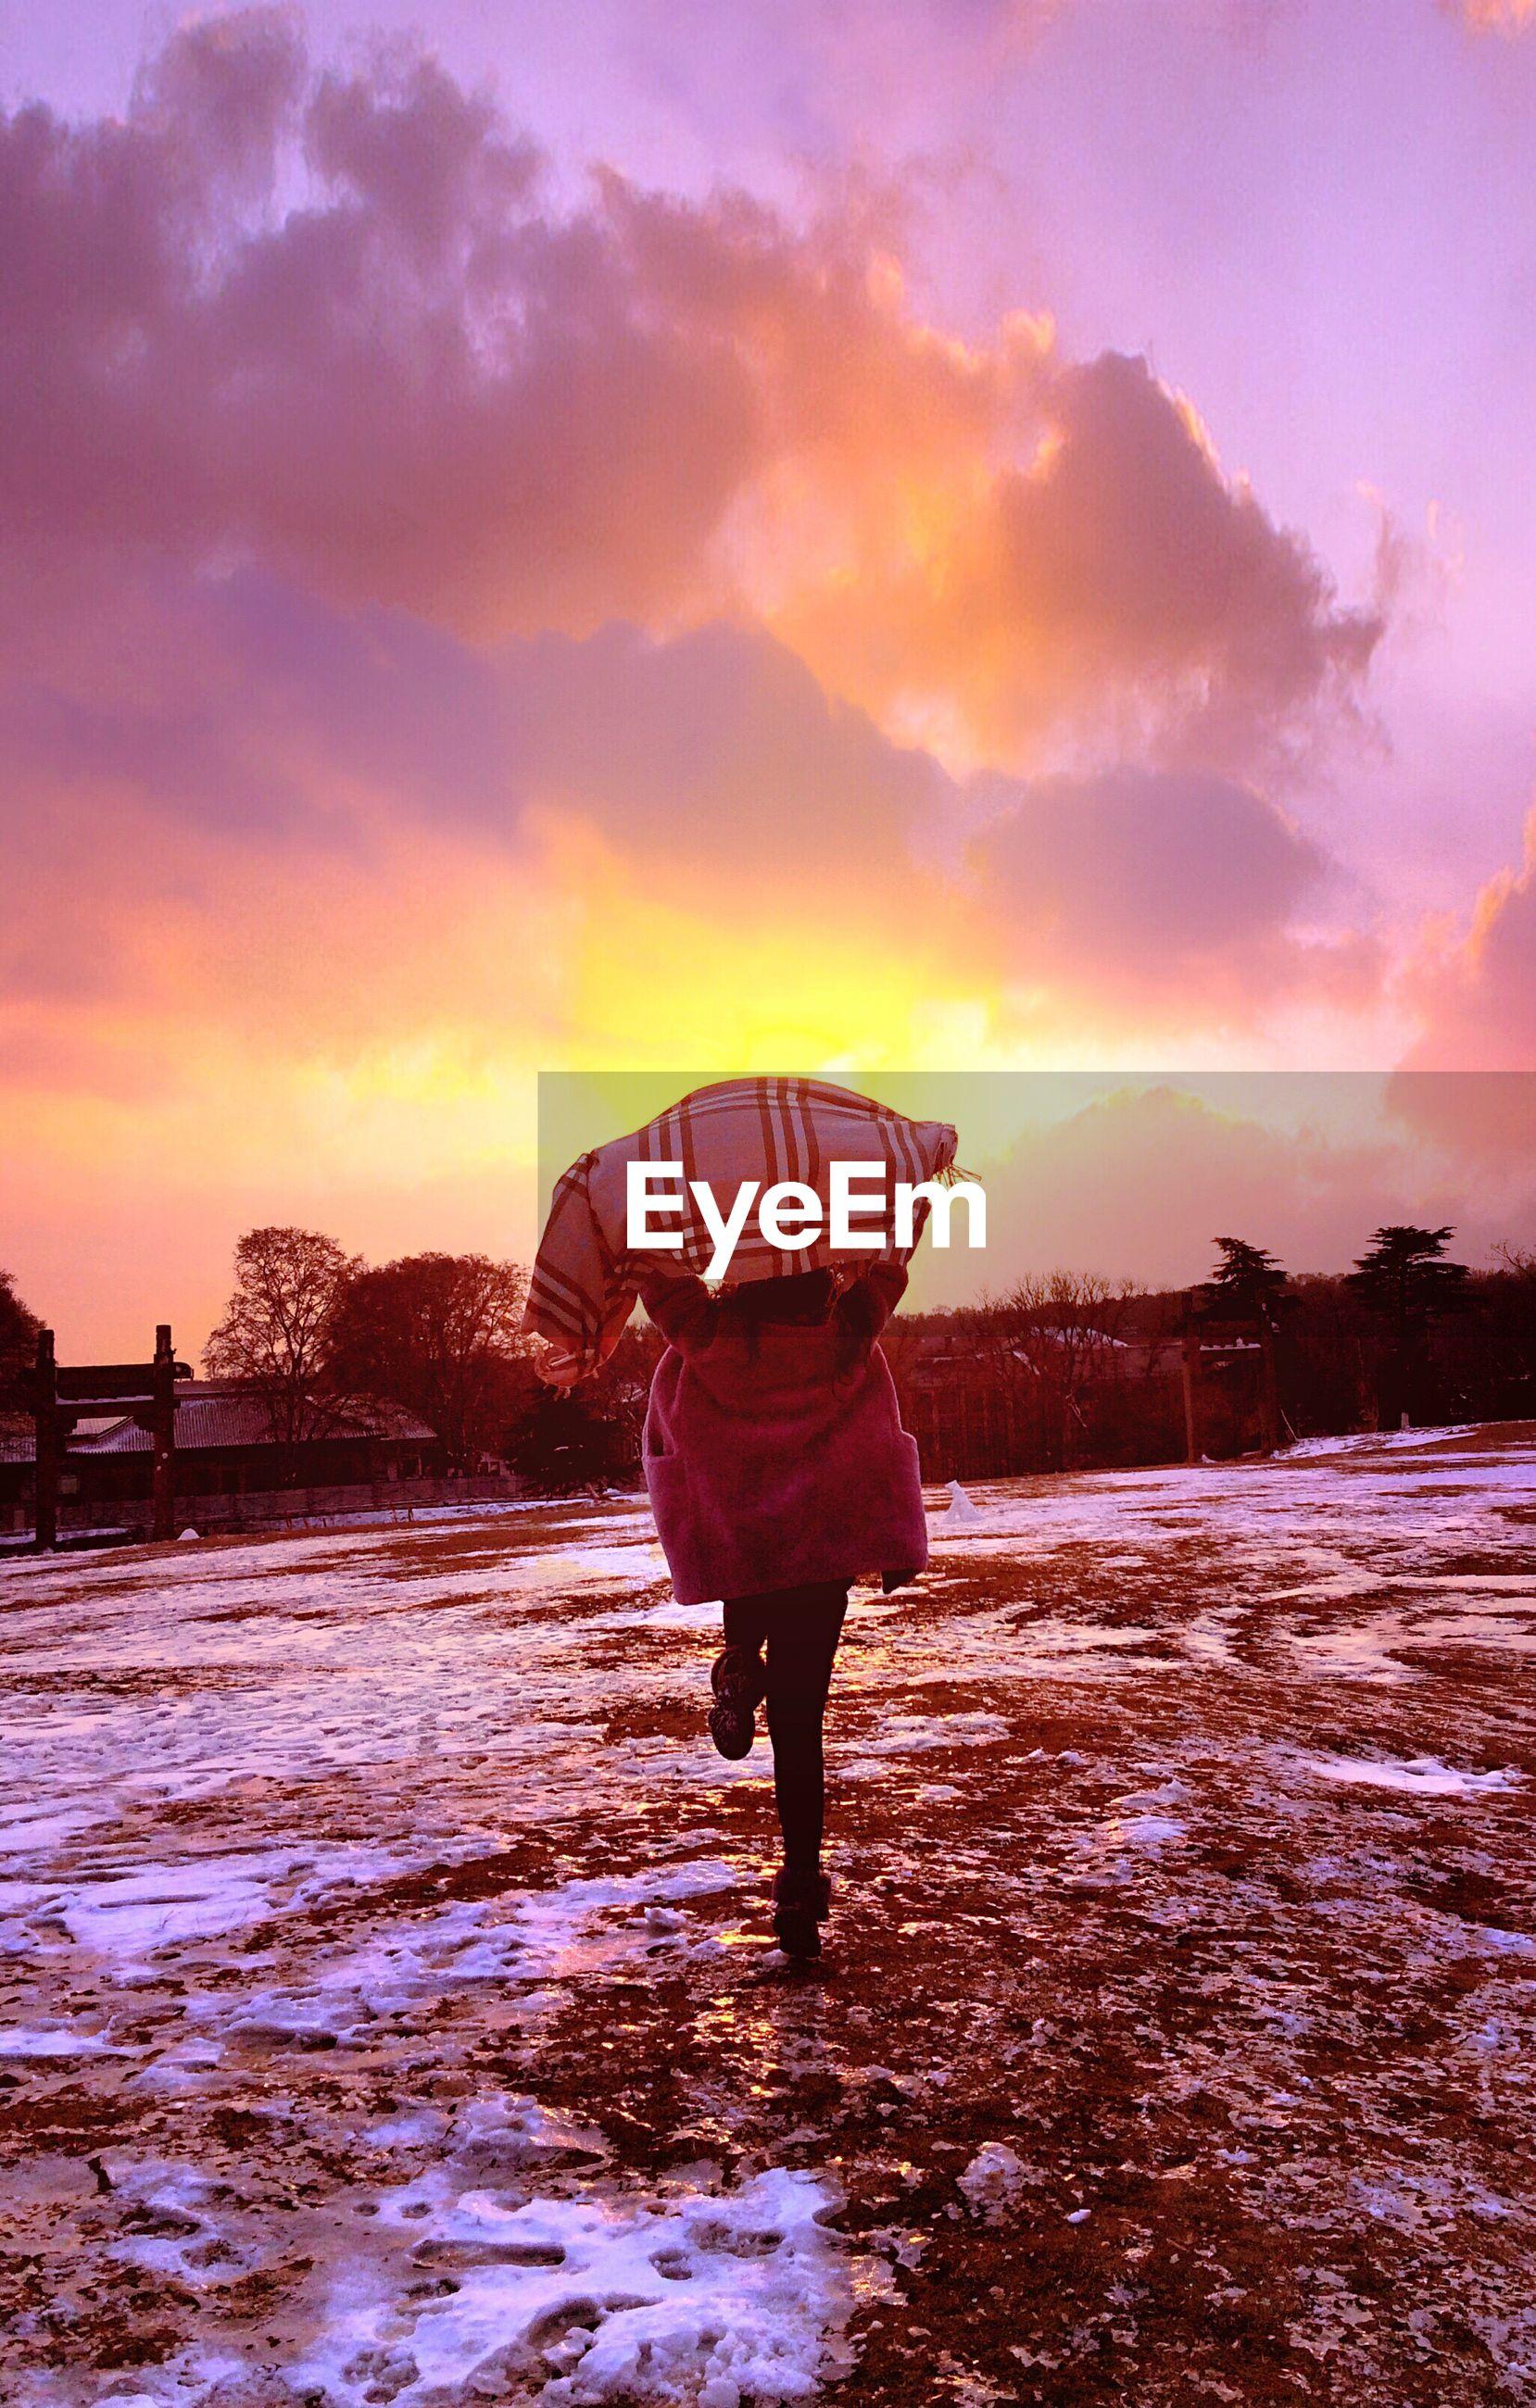 sunset, lifestyles, sky, leisure activity, rear view, water, full length, standing, cloud - sky, orange color, walking, men, season, weather, person, built structure, dusk, architecture